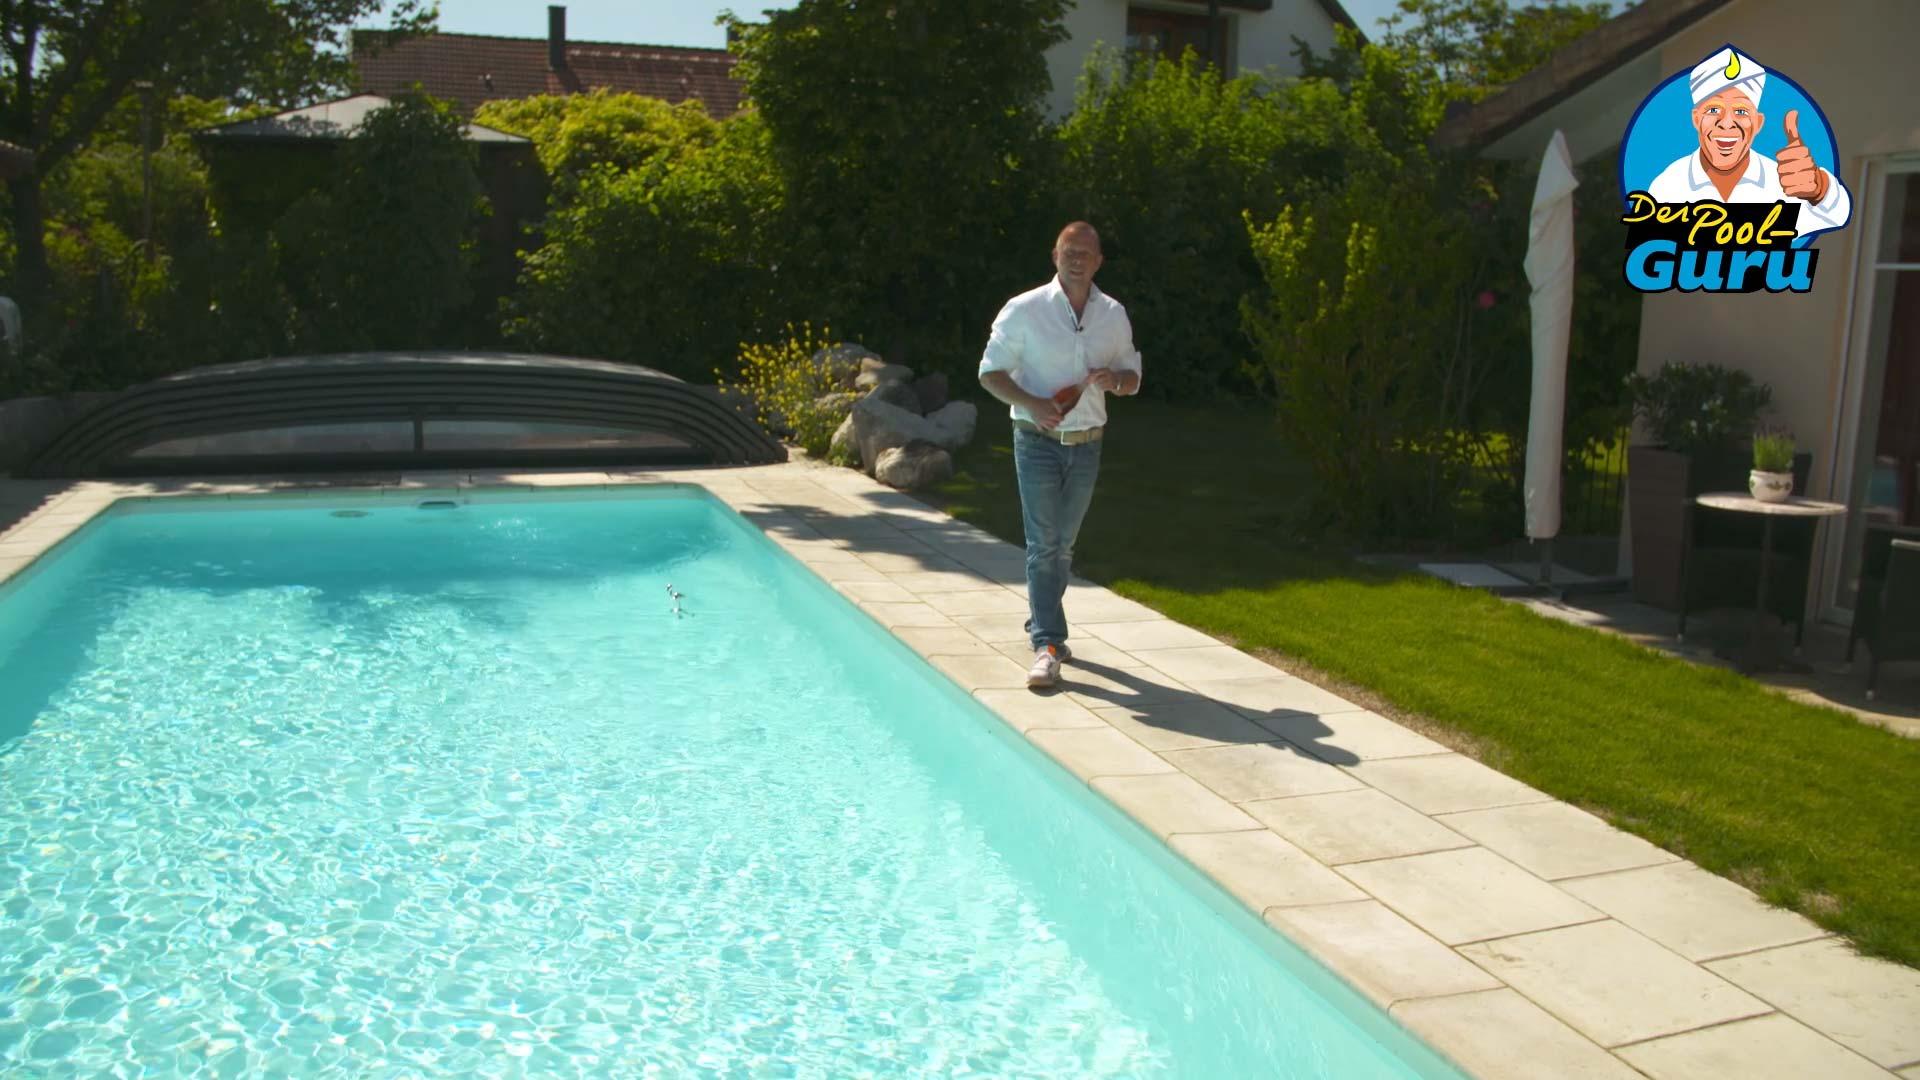 Poolbefüllung-Swimmingpool befüllen